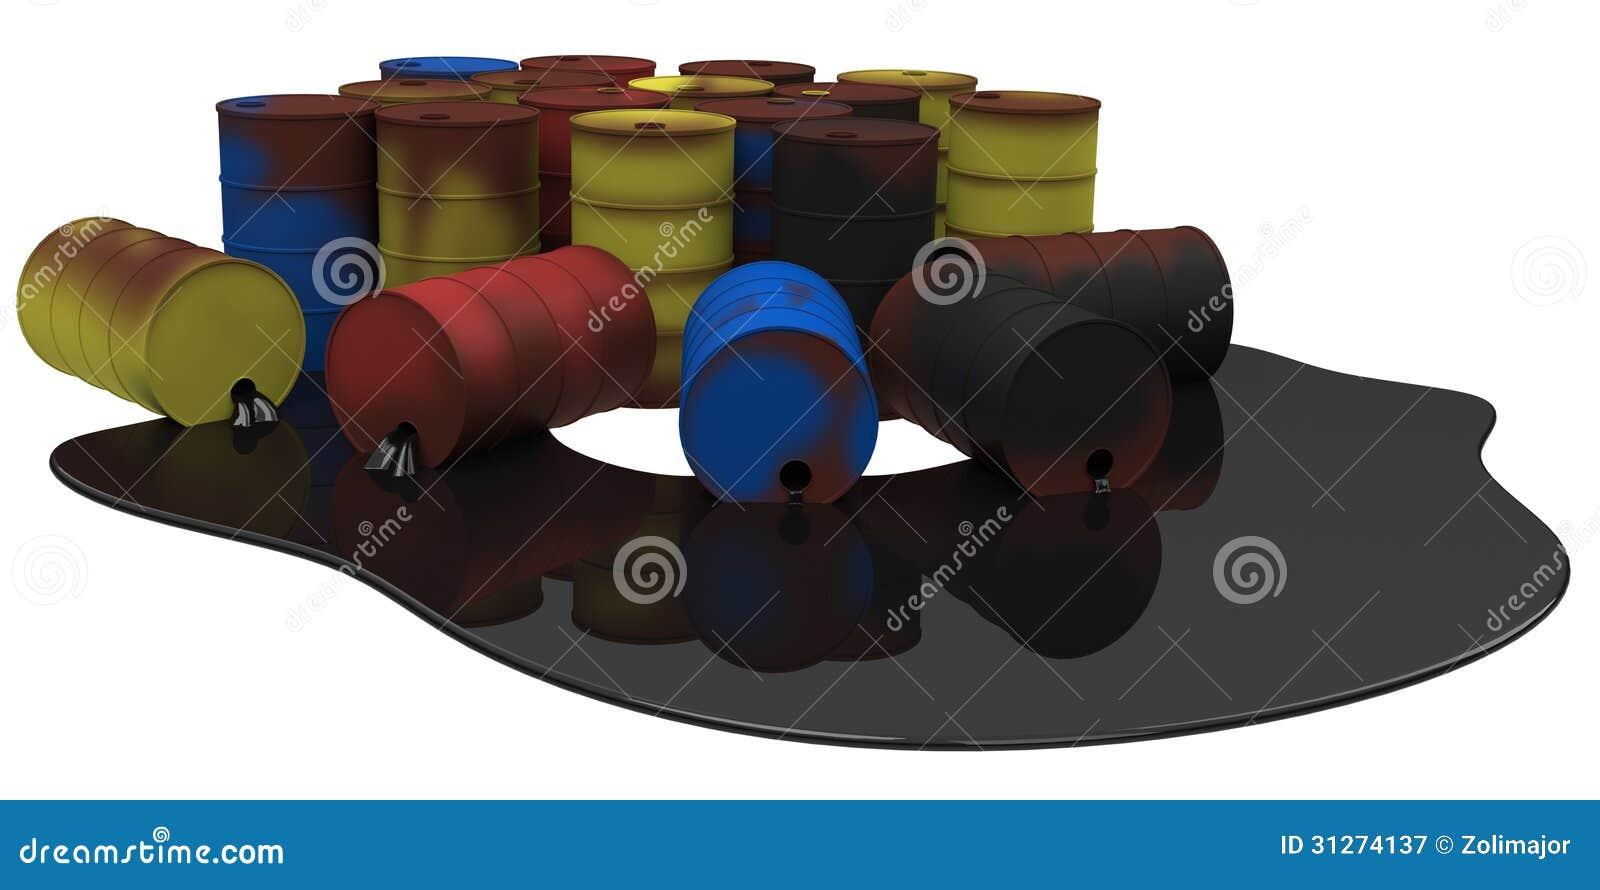 barrels with oil spill stock image image of fuel industrial 31274137. Black Bedroom Furniture Sets. Home Design Ideas